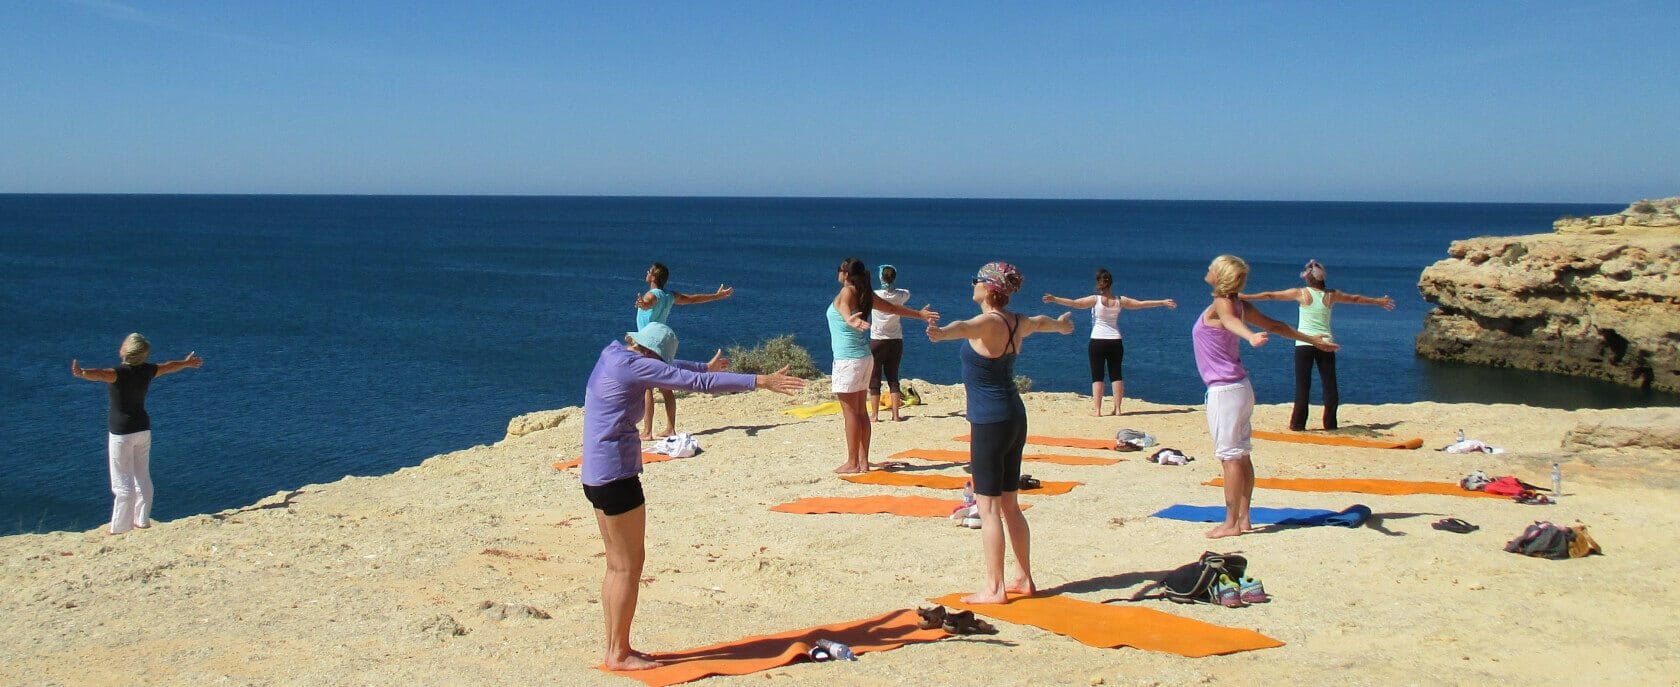 Qi Gong Urlaub: Gruppe übt auuf Klippe am Meer